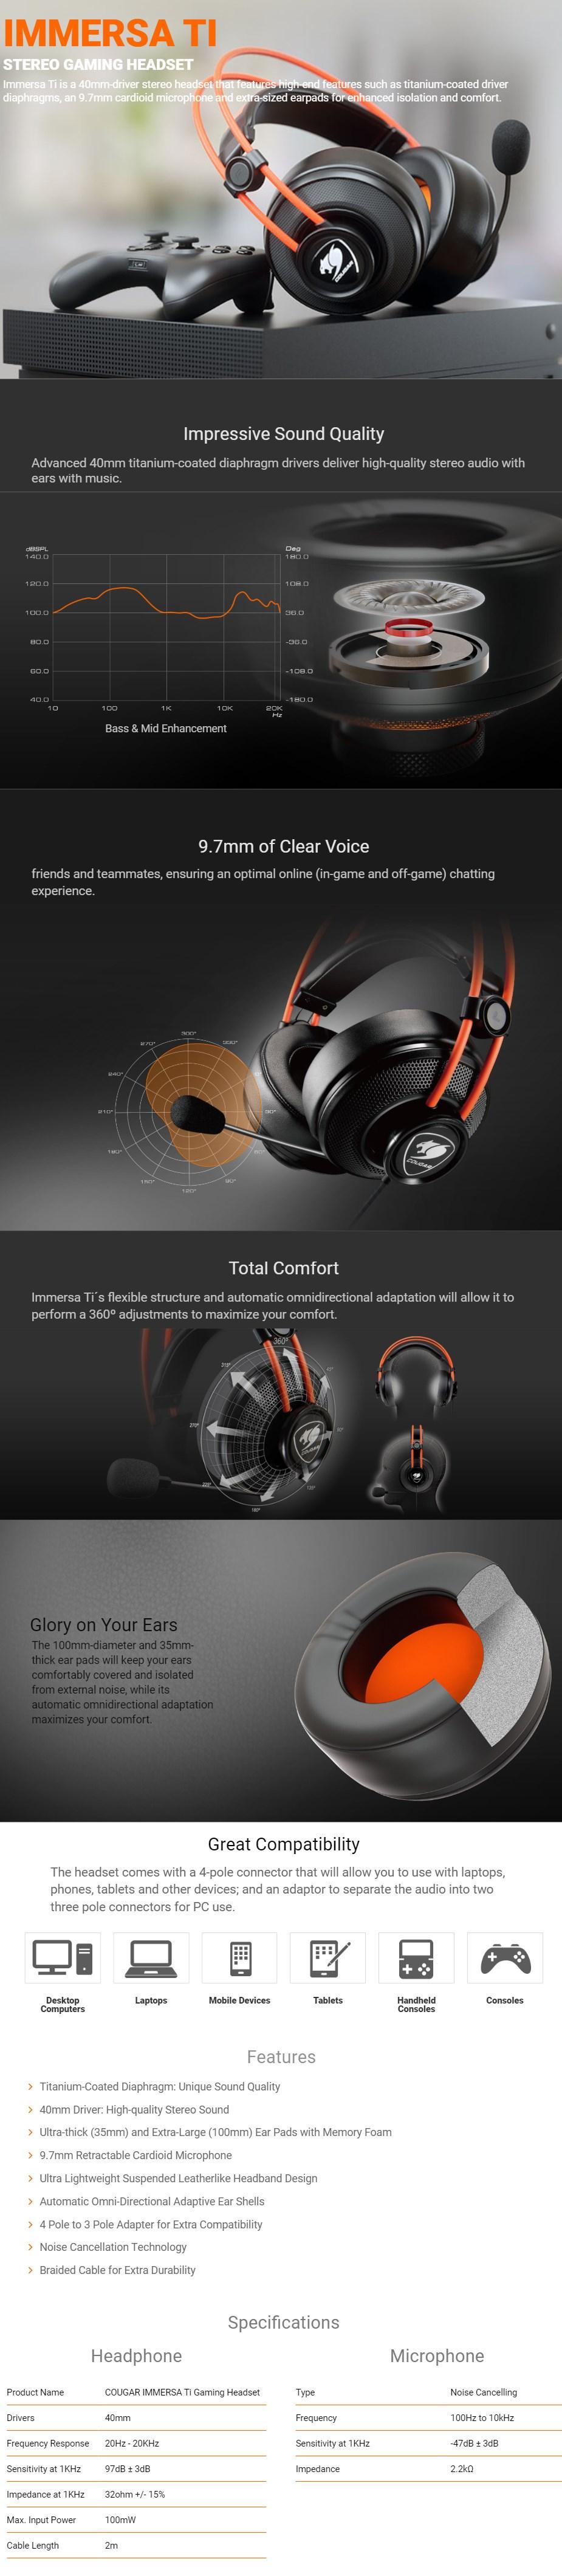 cougar-immersa-ti-sterafeo-gaming-headset-ac27651.jpg